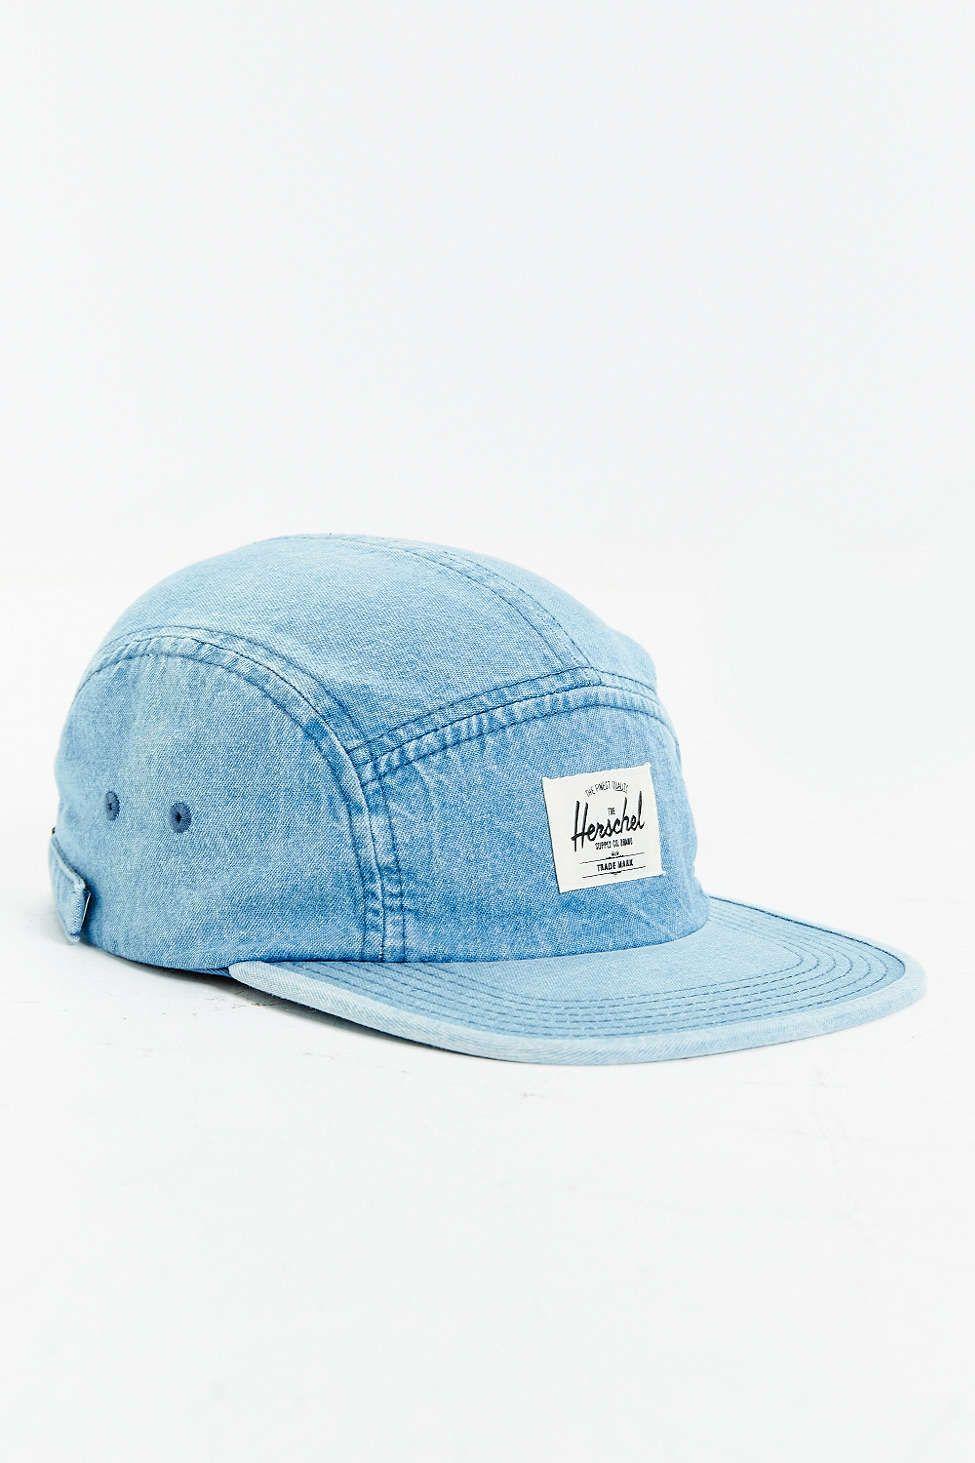 Herschel Supply Co. Glendale Faded Denim 5-Panel Baseball Hat ... 7cfeaaf2718